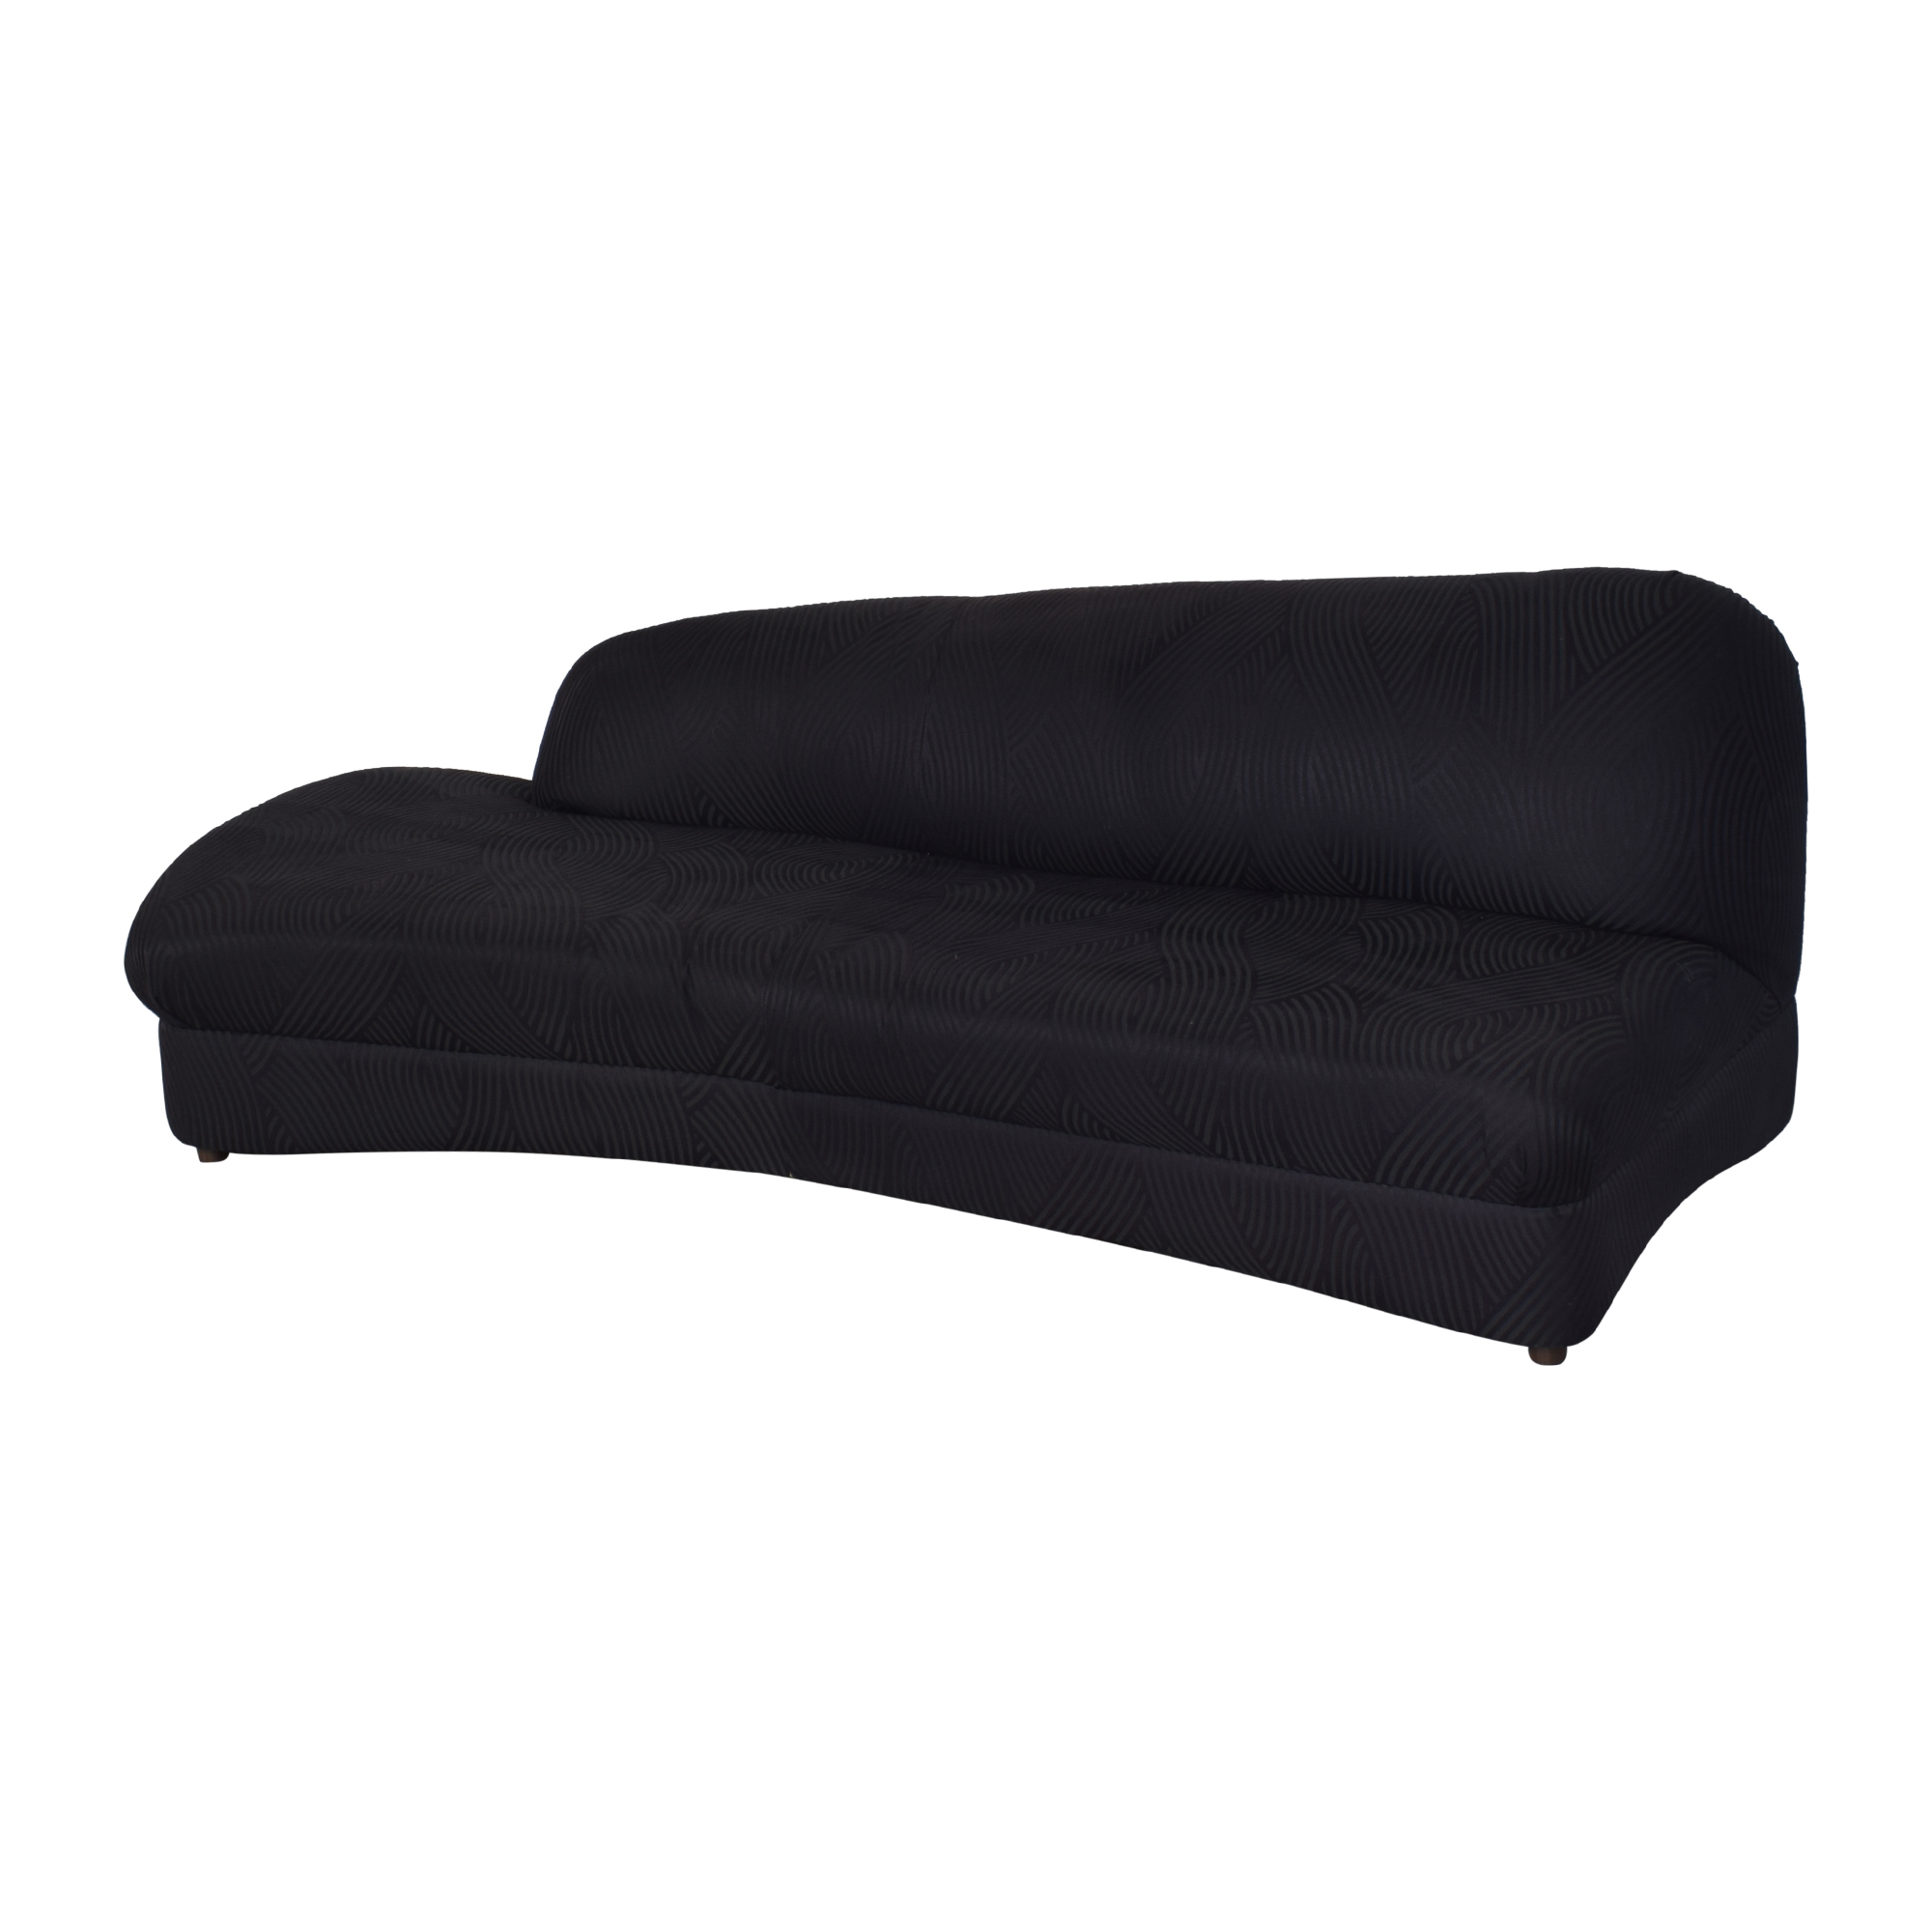 Carter Furniture Carter Remsen Curved Sofa second hand